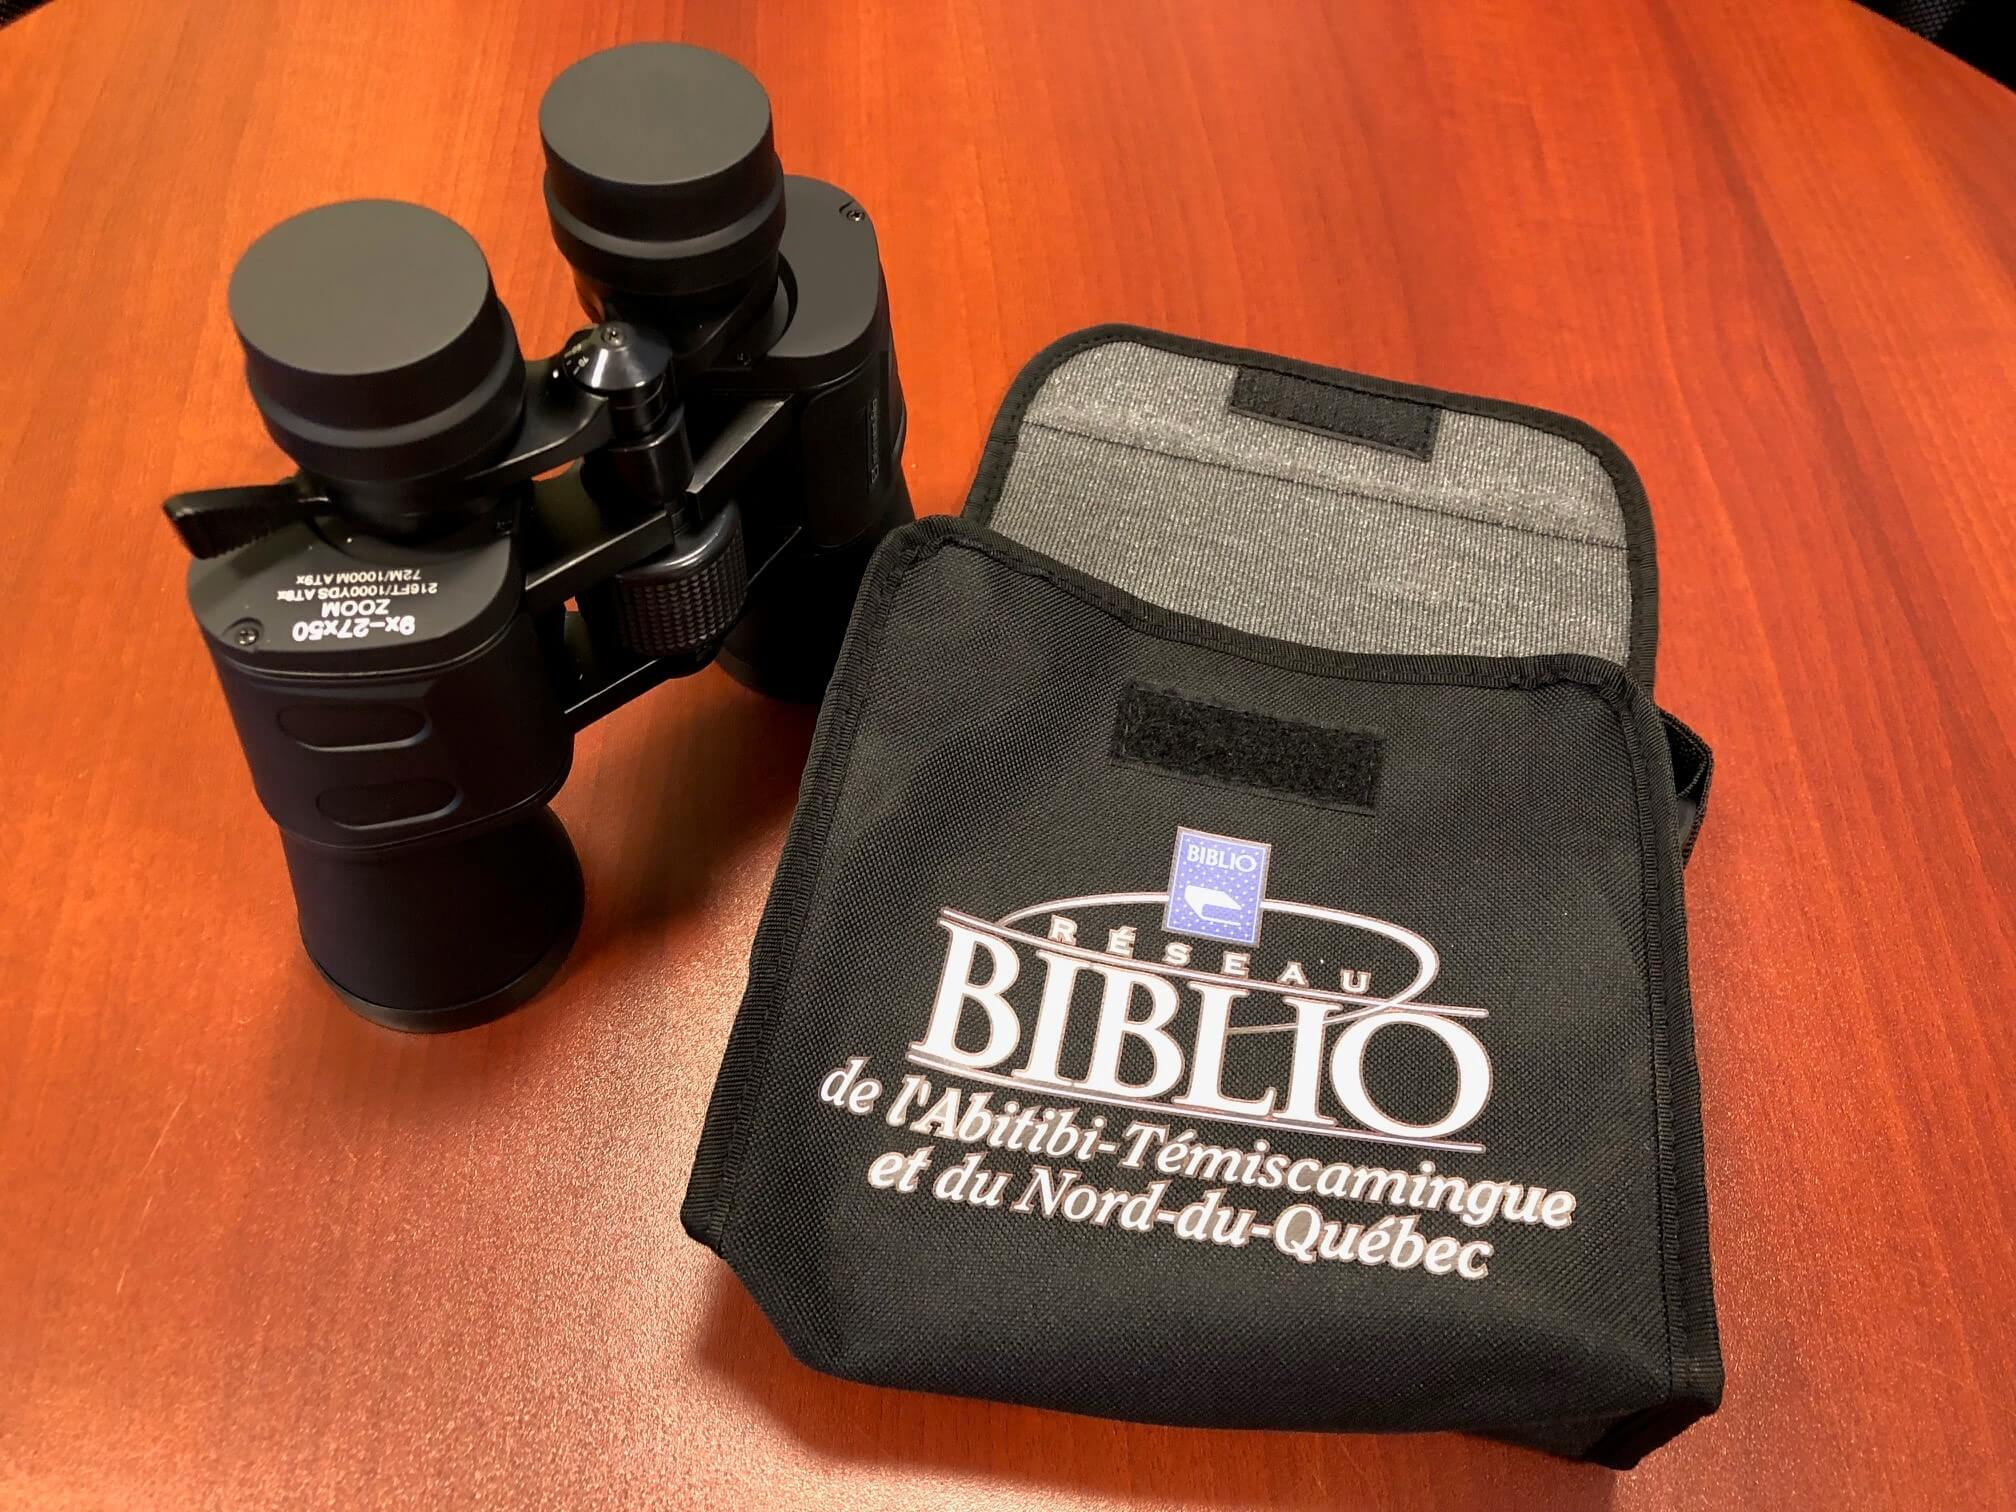 Réseau BIBLIO